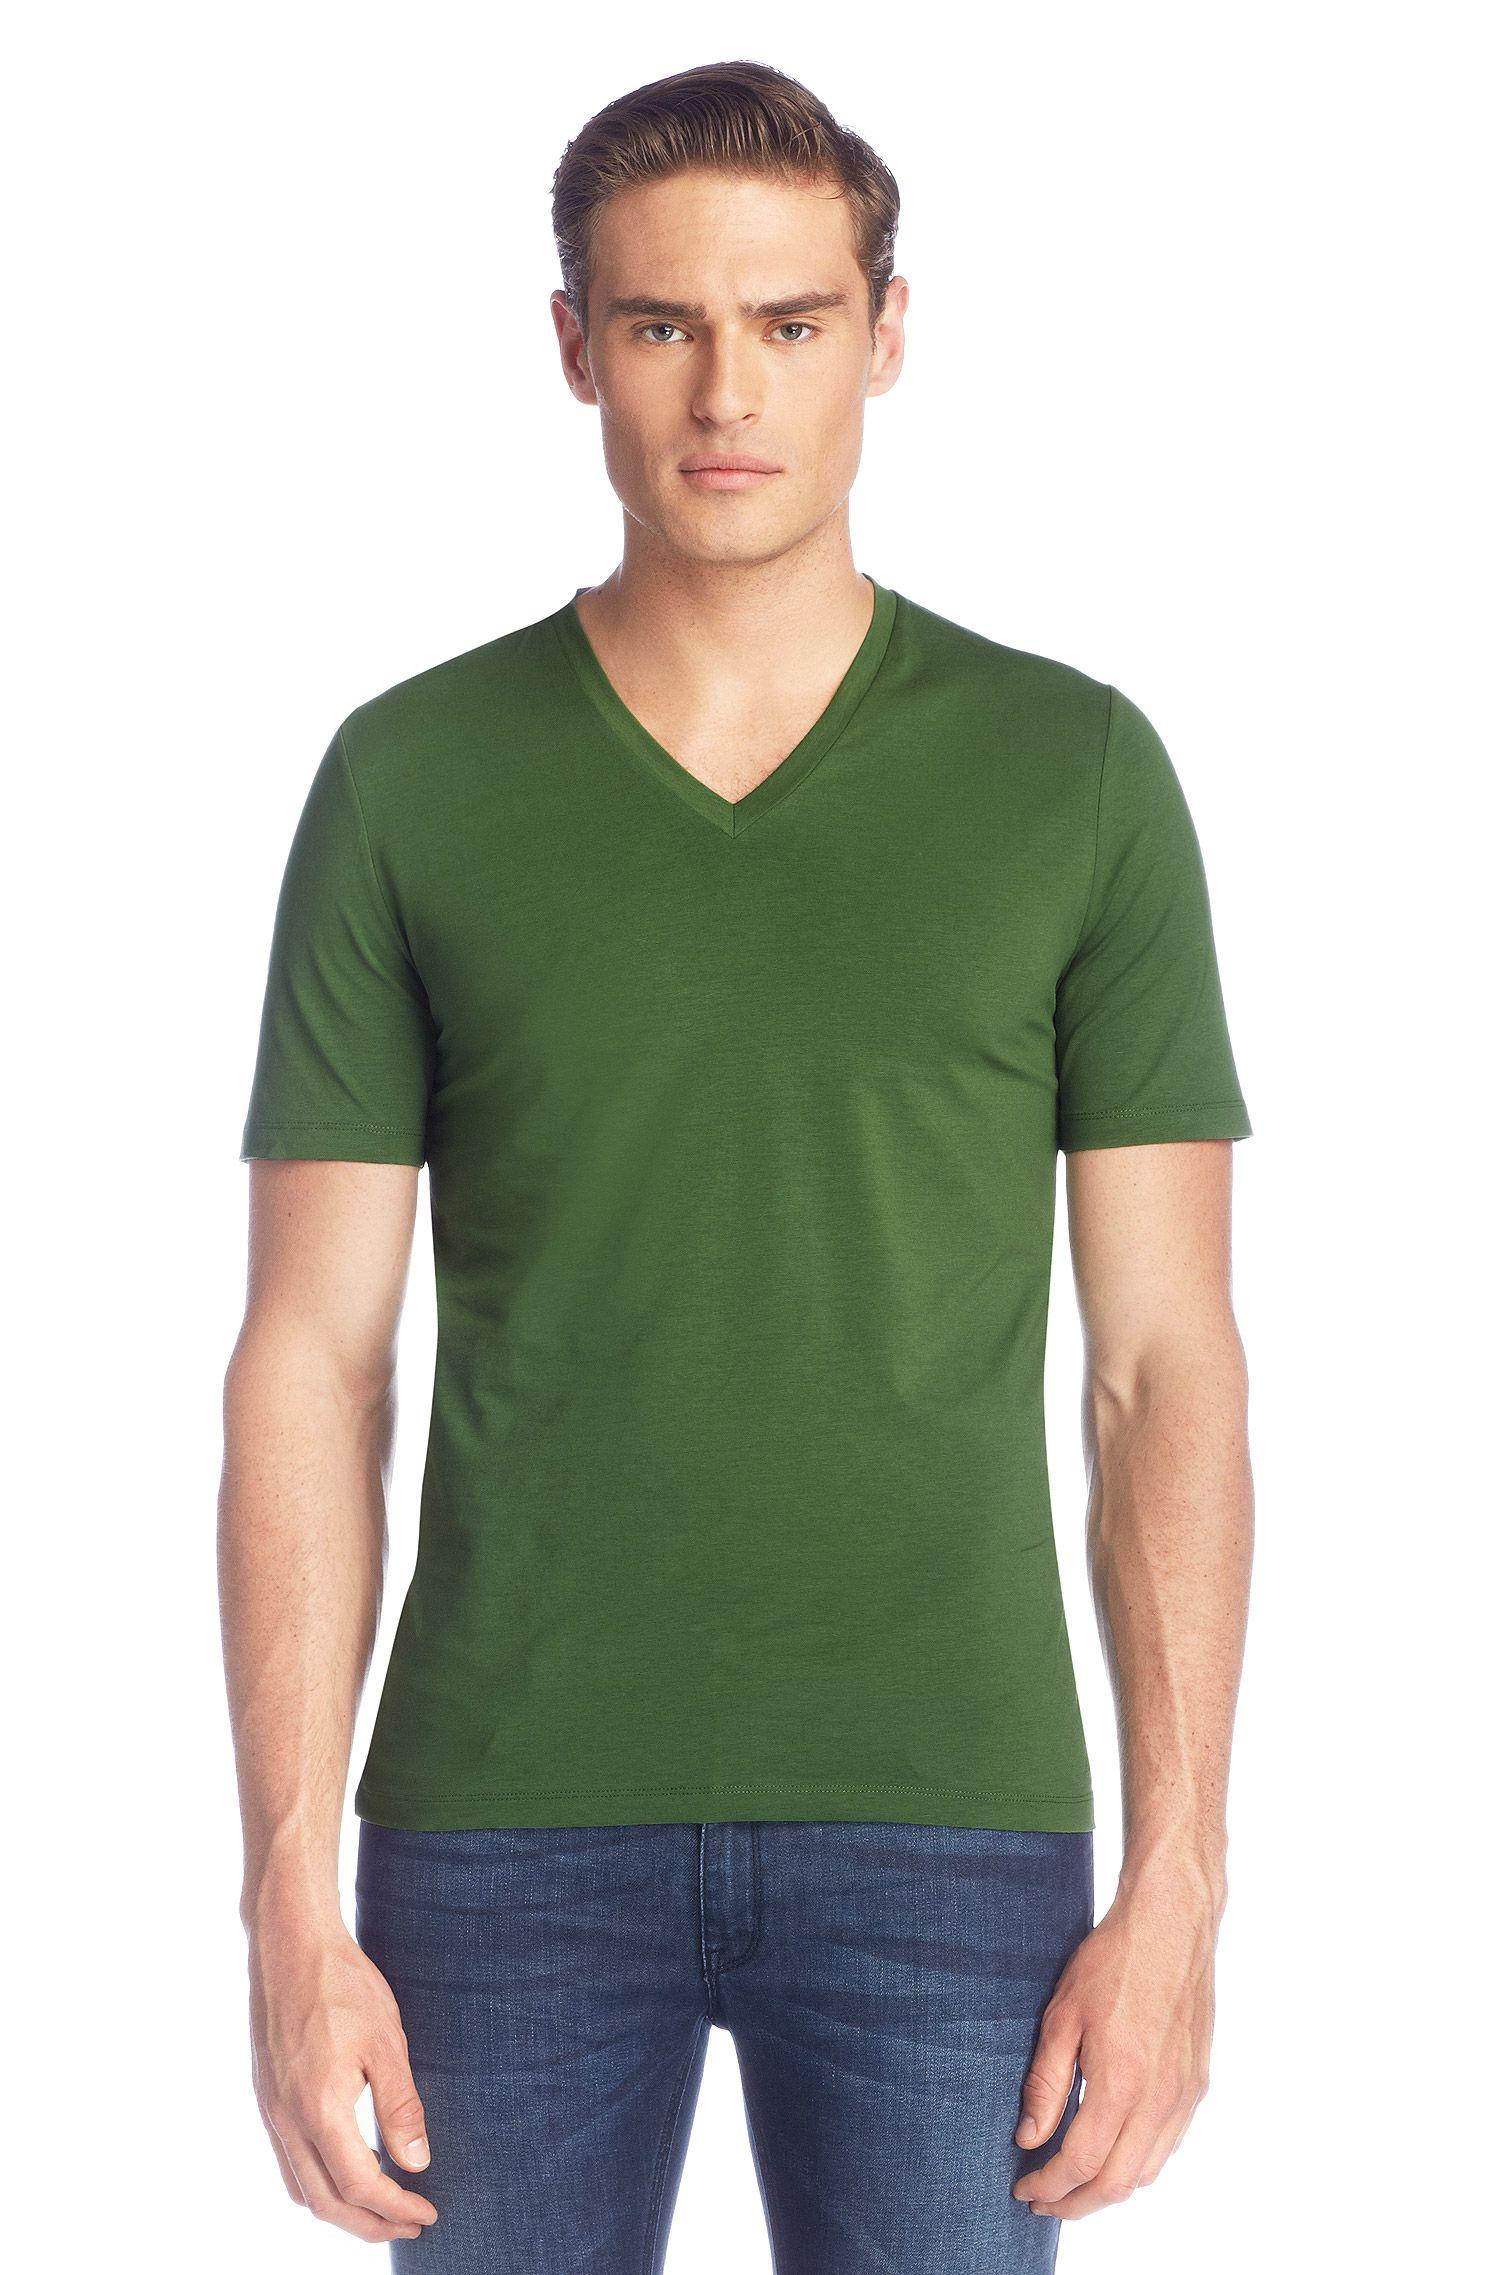 T-Shirt ´Dredoso` aus Baumwollkomposition